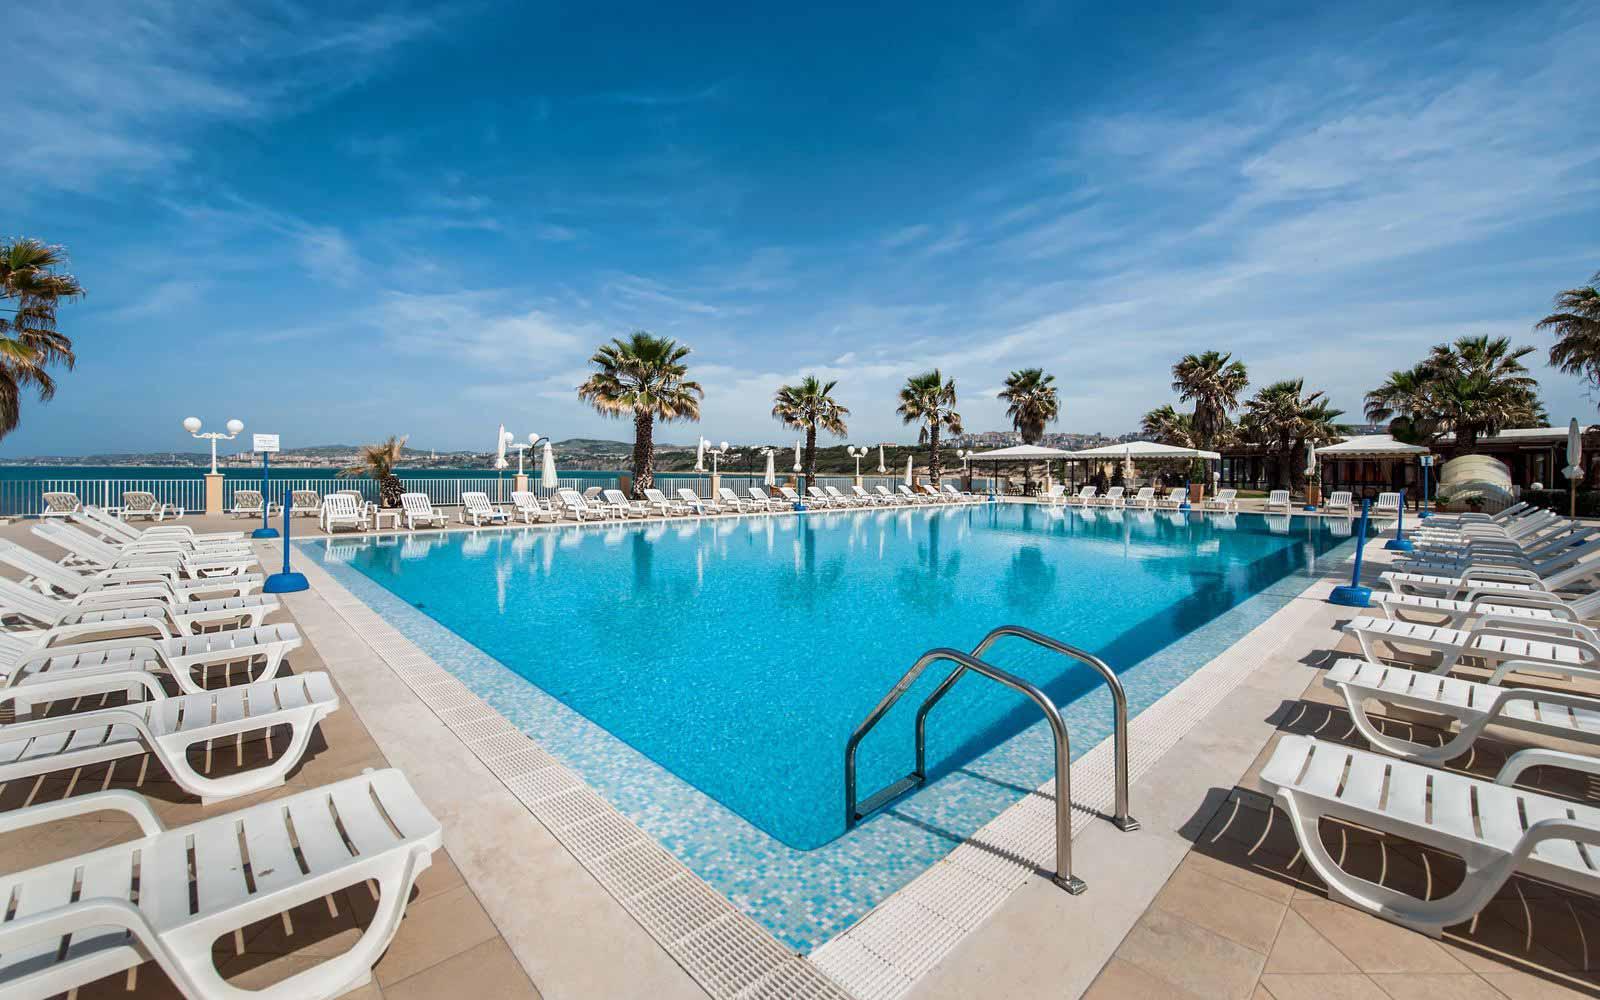 Swimming pool at Dioscuri Bay Palace